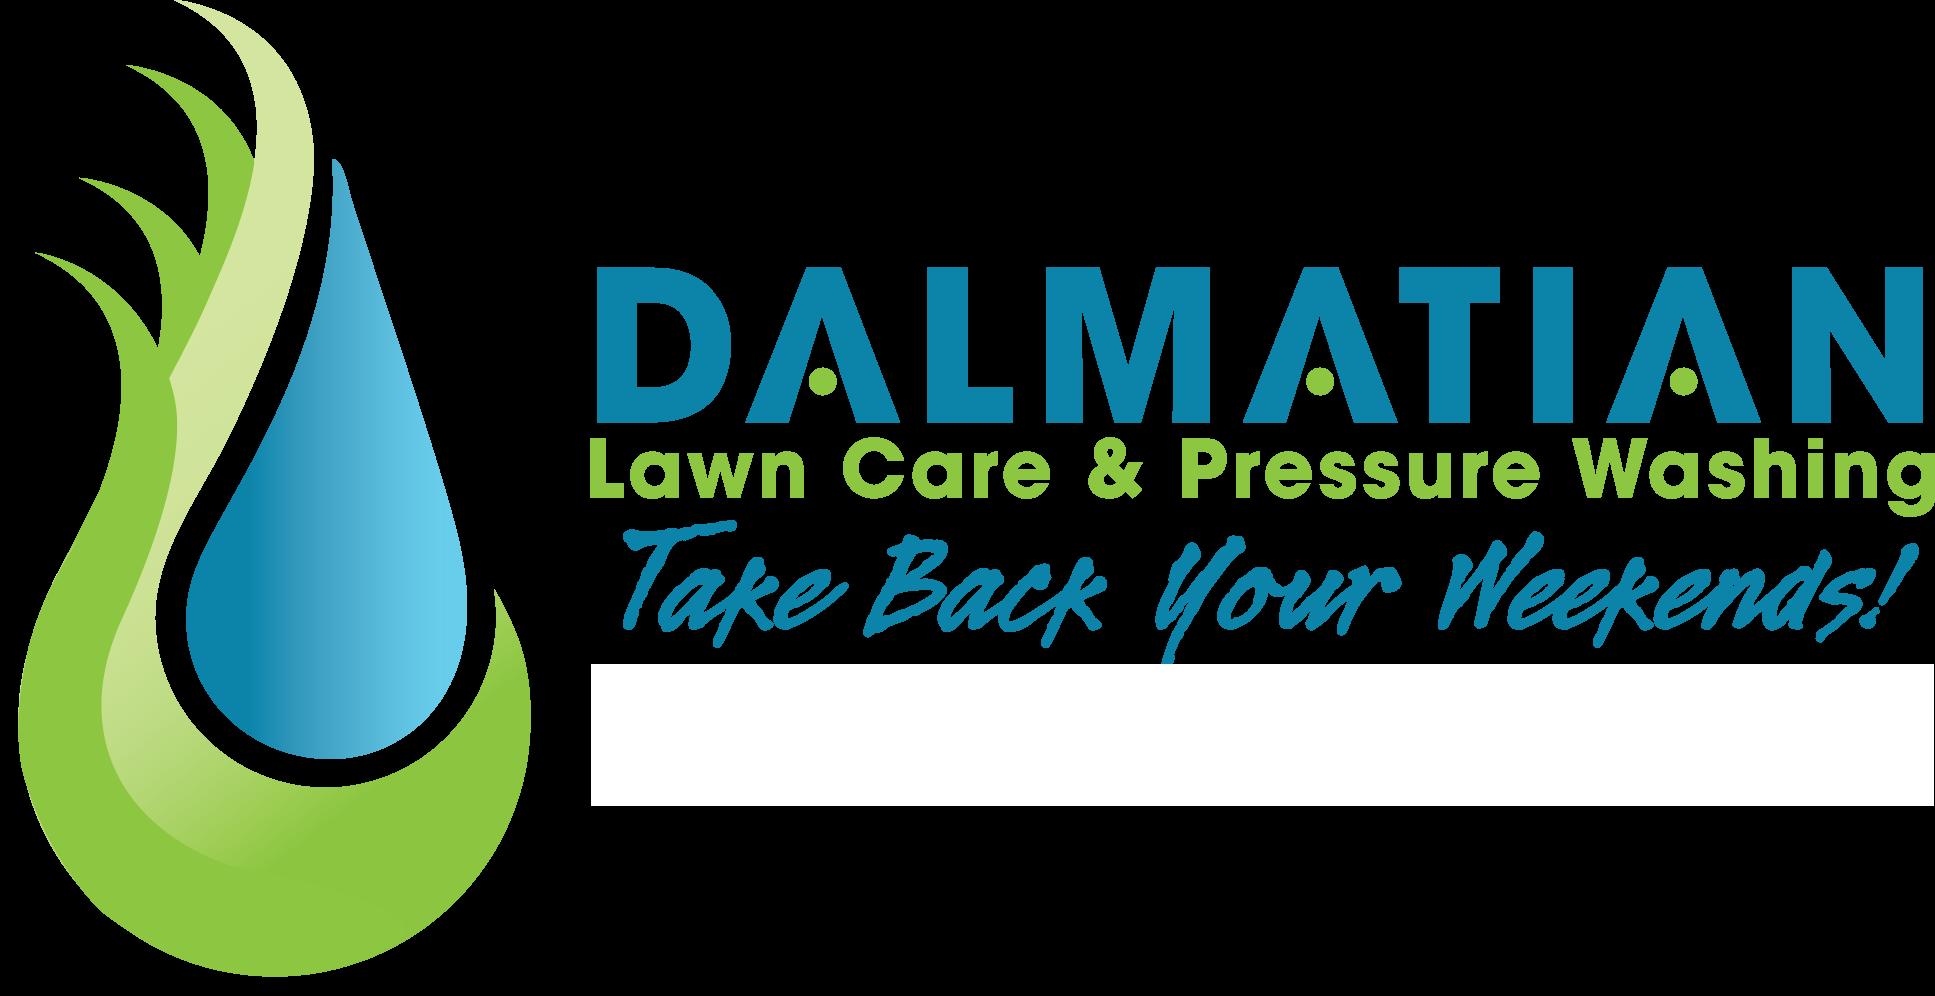 North Carolina's Top Rated Local® Lawn Care Companies Award Winner: Dalmatian Lawn Care and Pressure Washing, LLC